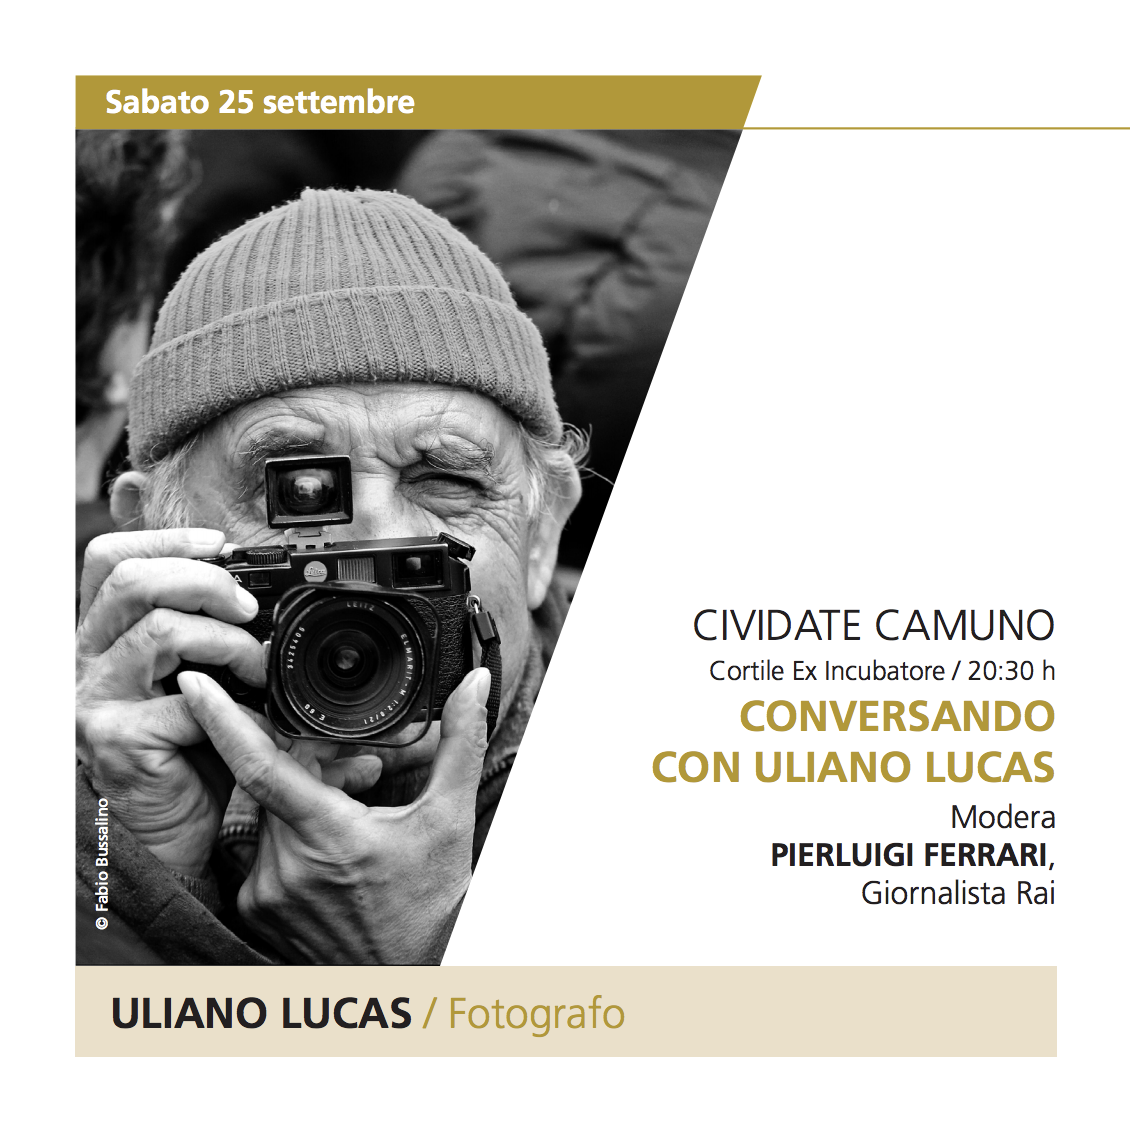 Uliano Lucas - dada valle camonica